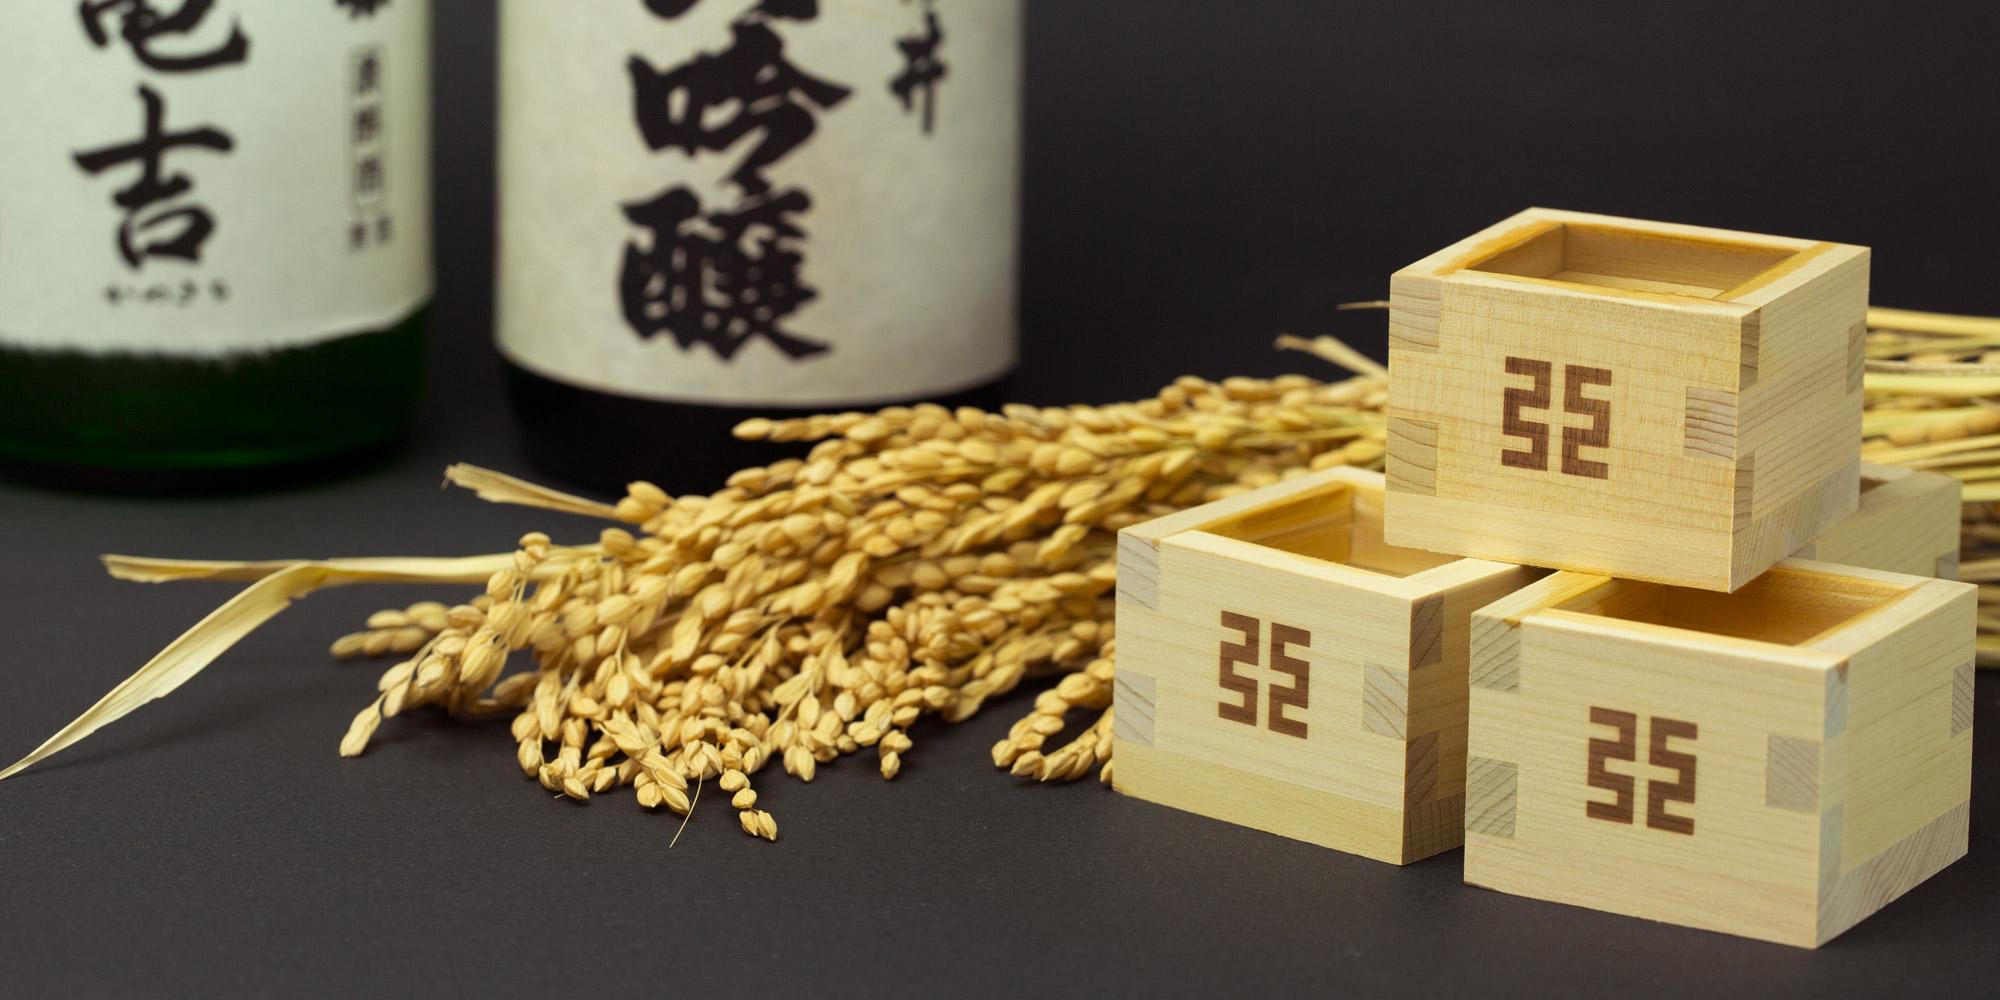 Kuroishi Sake